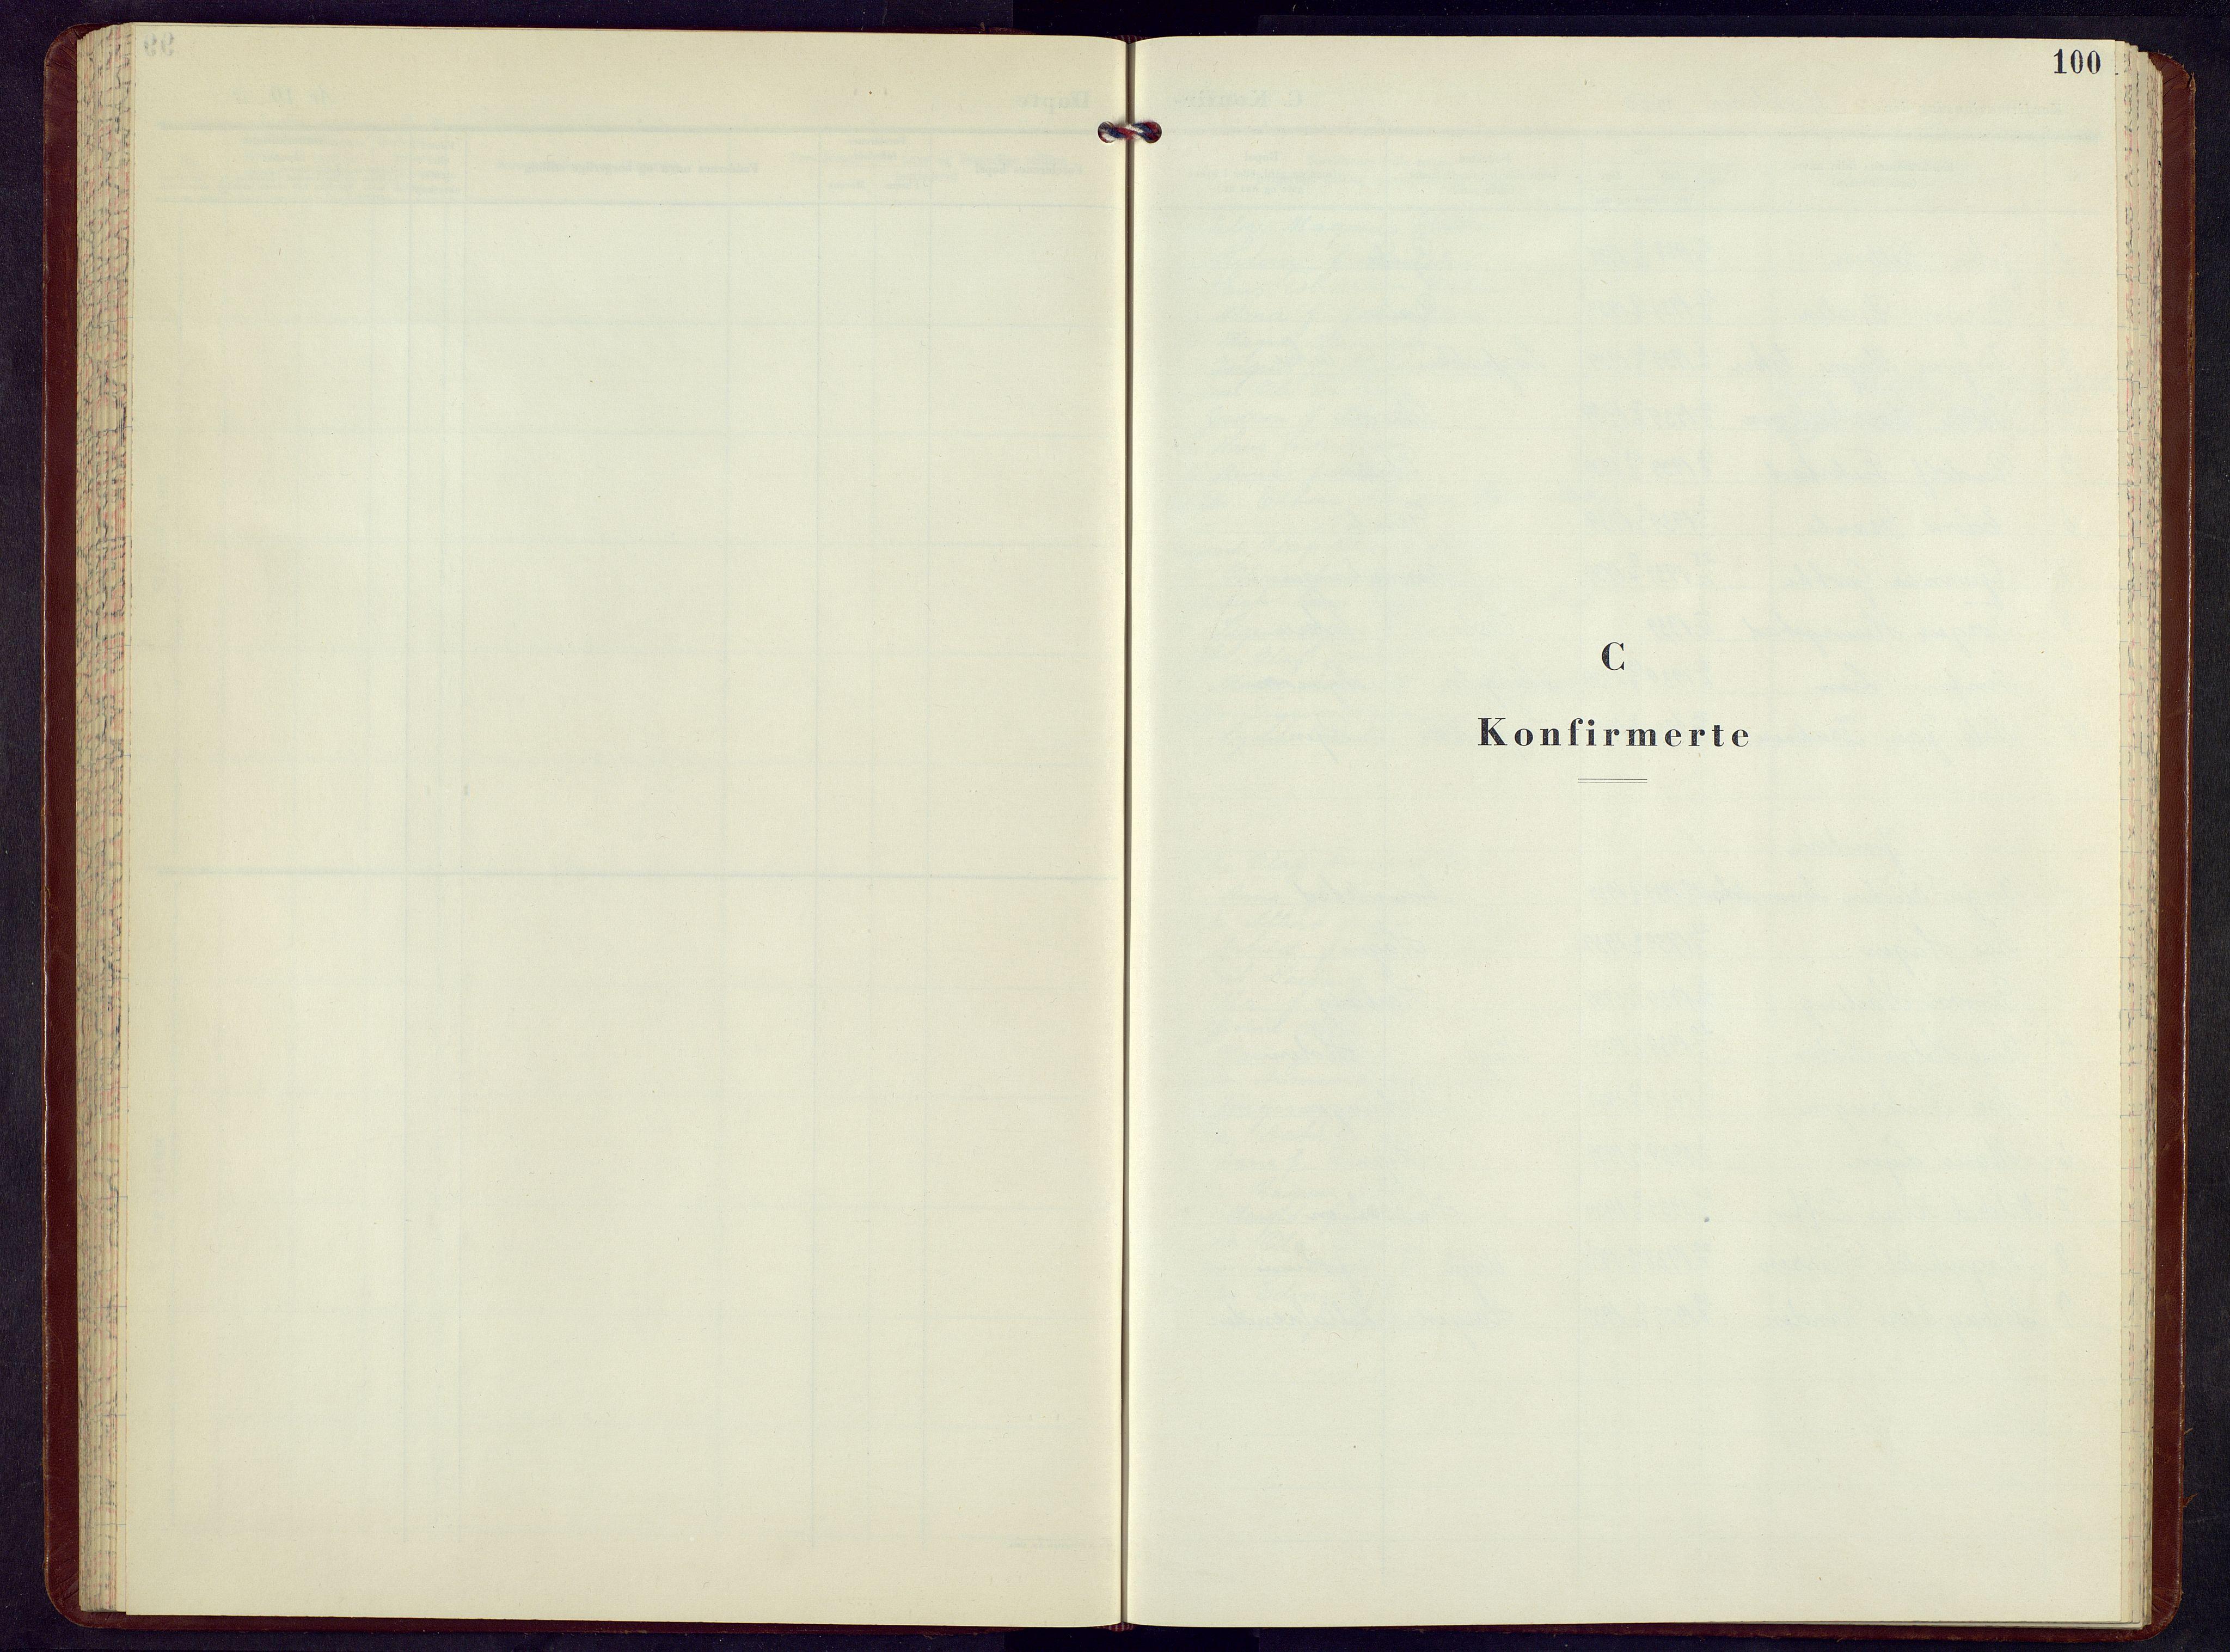 SAH, Sel prestekontor, Klokkerbok nr. 7, 1953-1973, s. 100